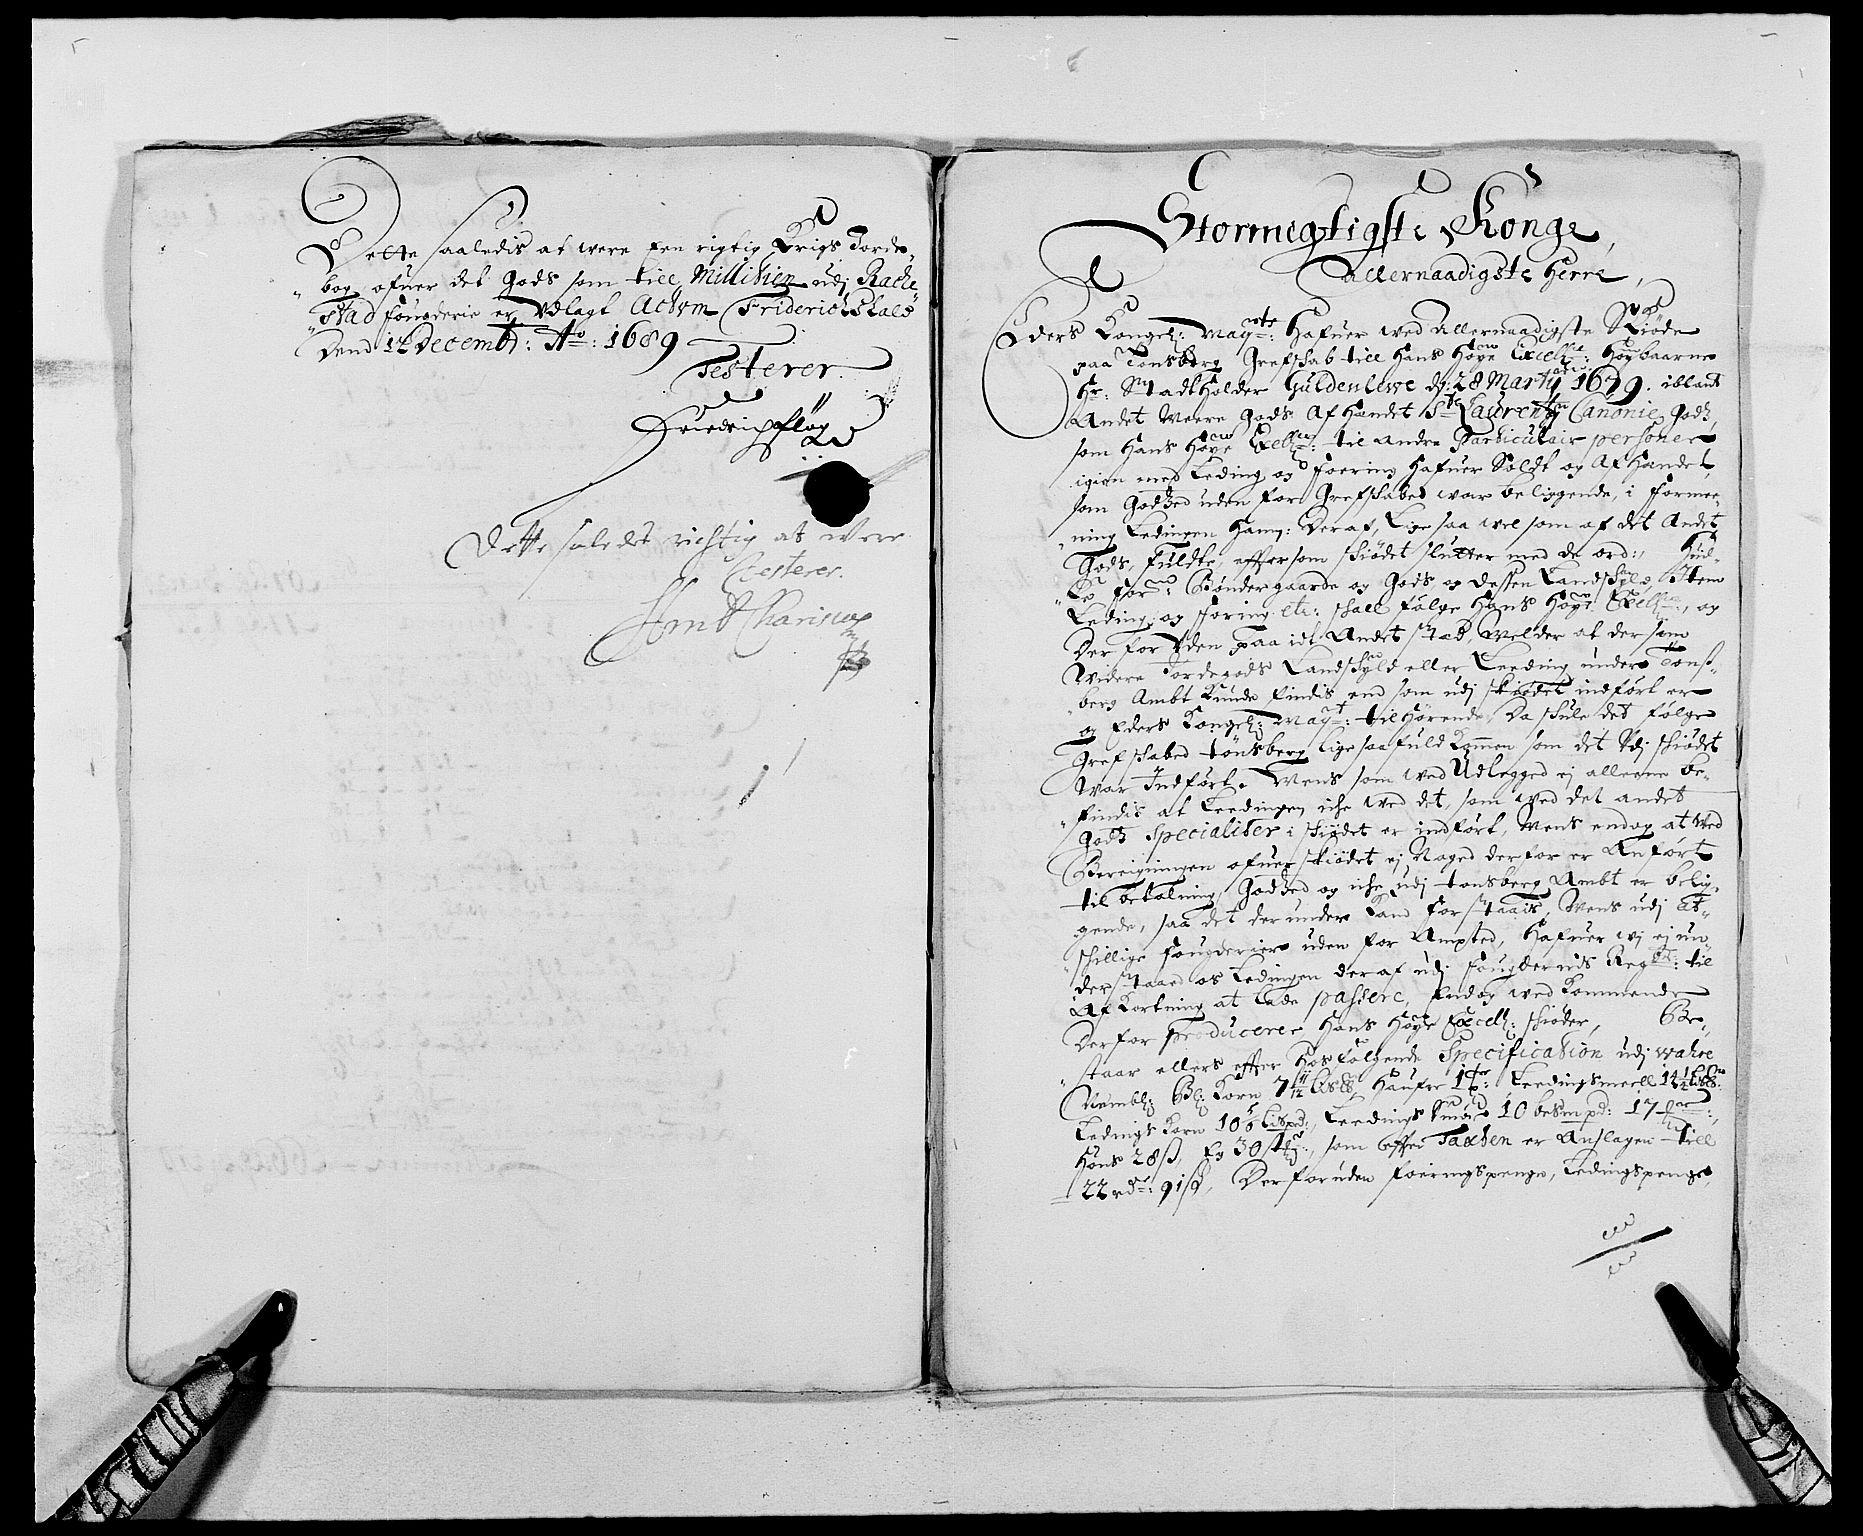 RA, Rentekammeret inntil 1814, Reviderte regnskaper, Fogderegnskap, R05/L0277: Fogderegnskap Rakkestad, 1689-1690, s. 331